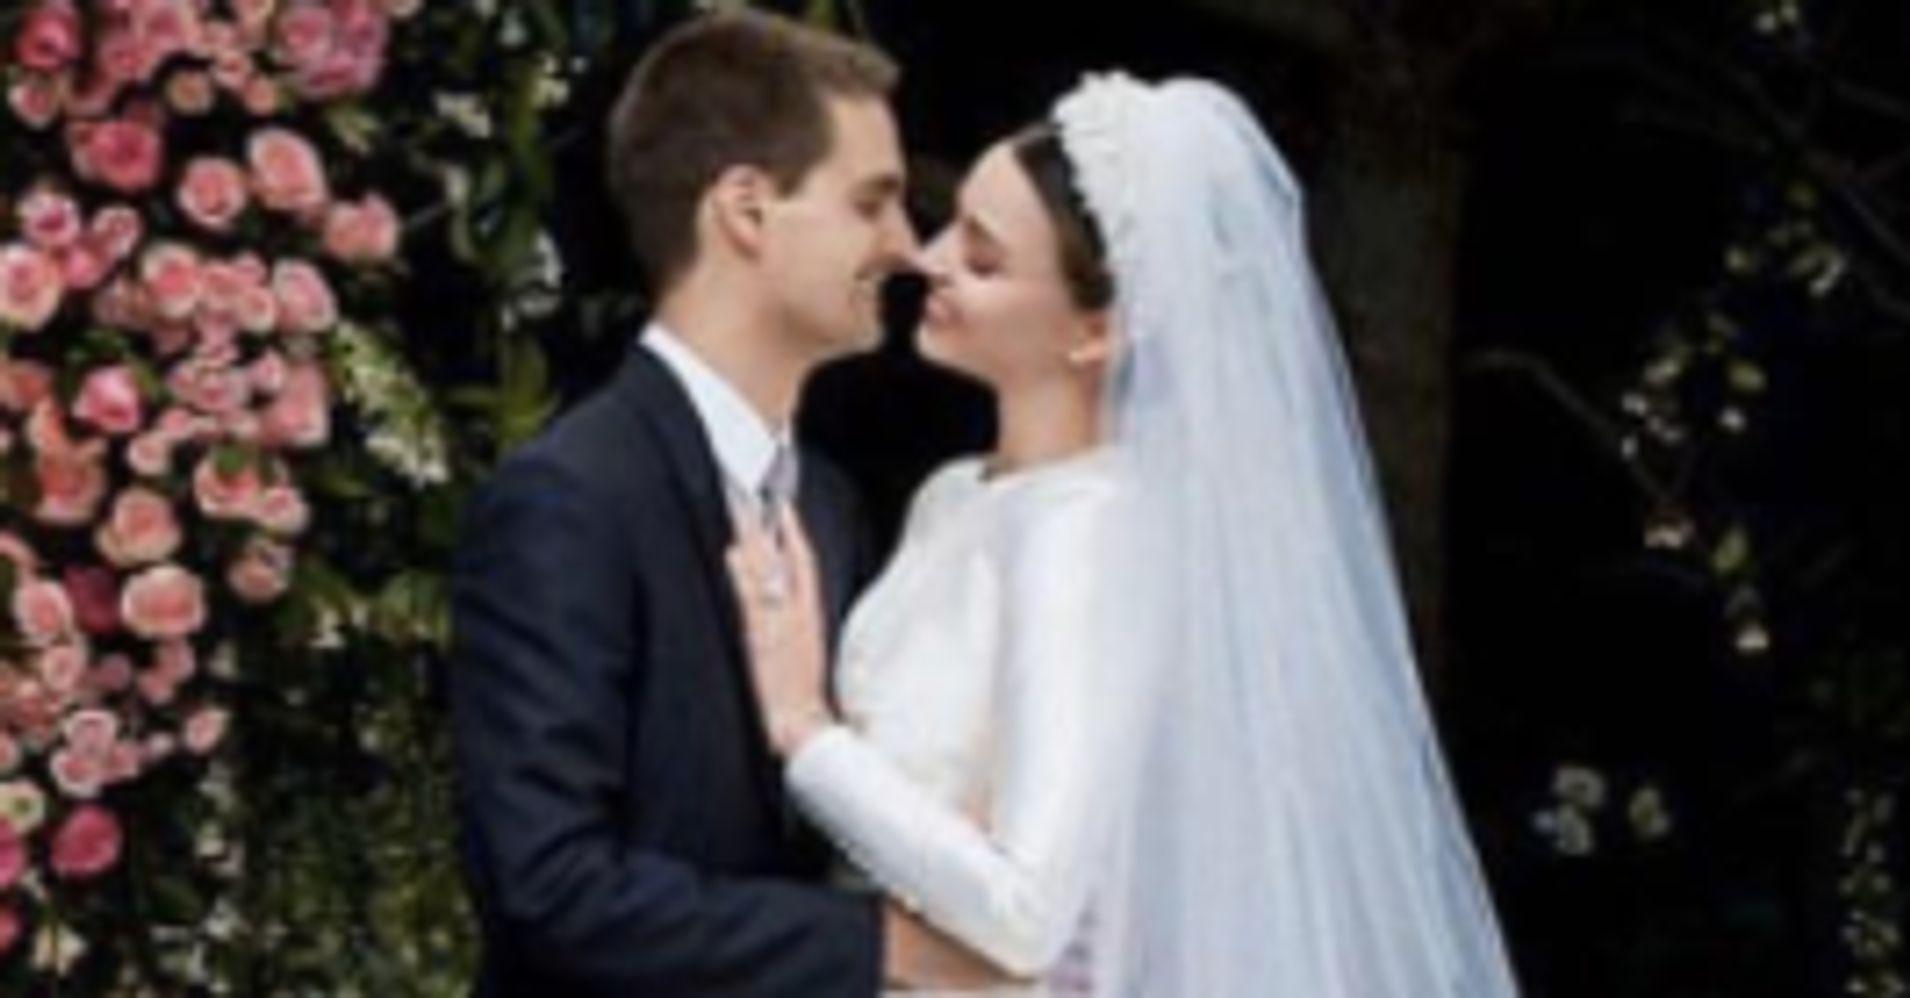 Miranda Kerr Reveals Her Stunning Dior Couture Wedding Gown ...